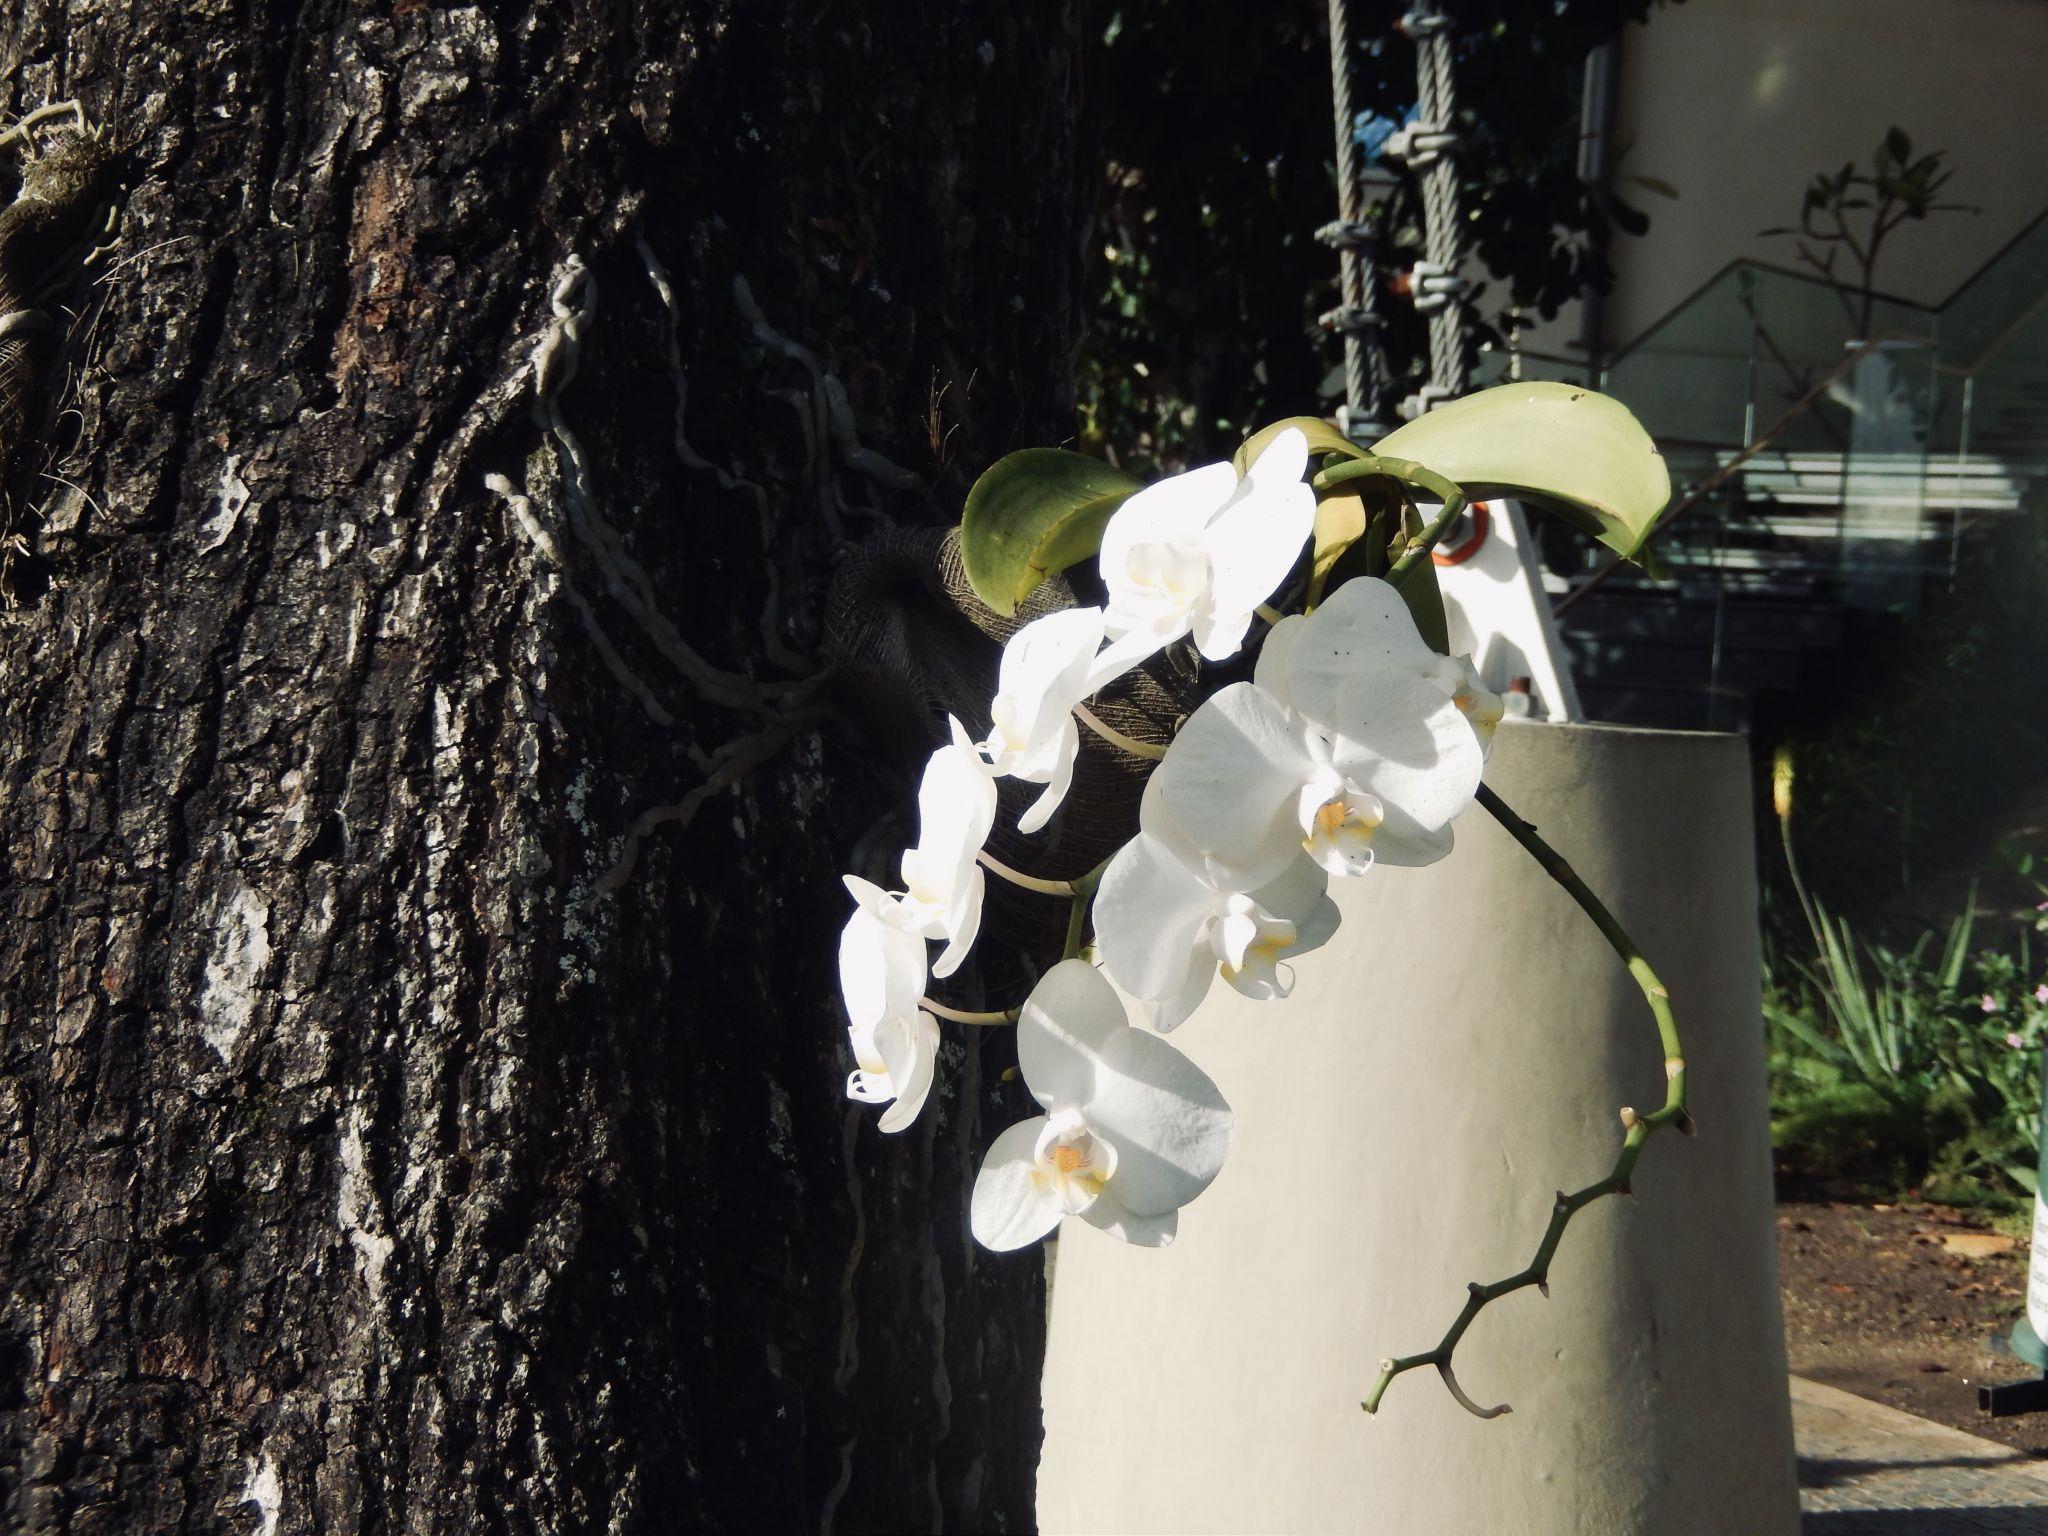 Orchid on tree in Rio de Janeiro